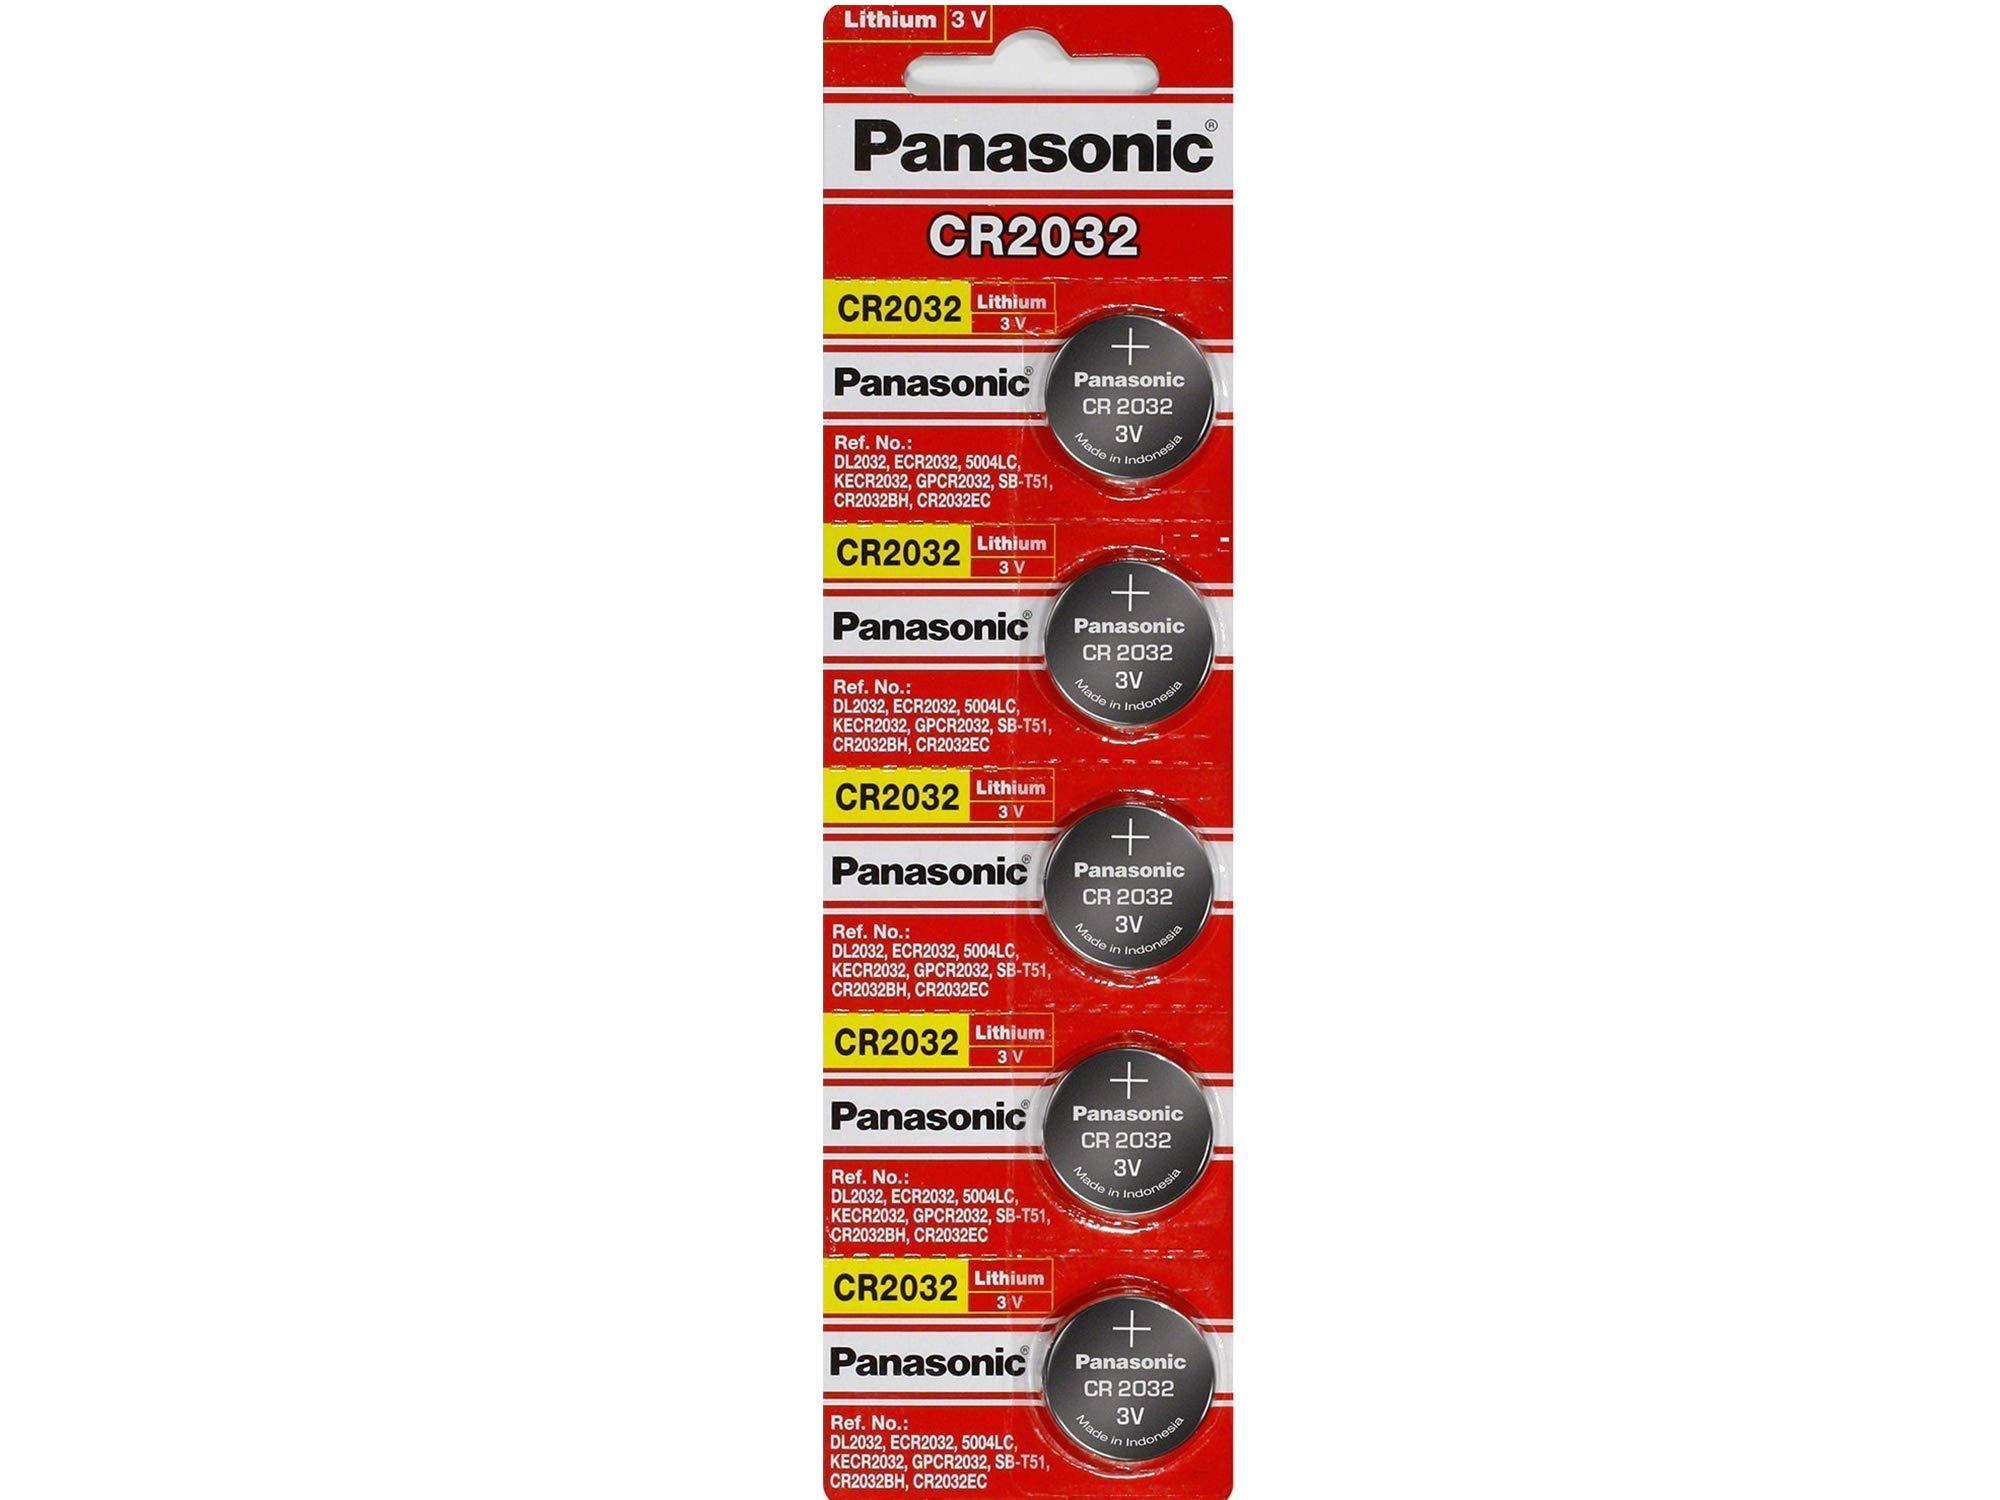 Panasonic CR2032 Lithium 3 Volt Battery (5 pieces) by Panasonic (Image #2)